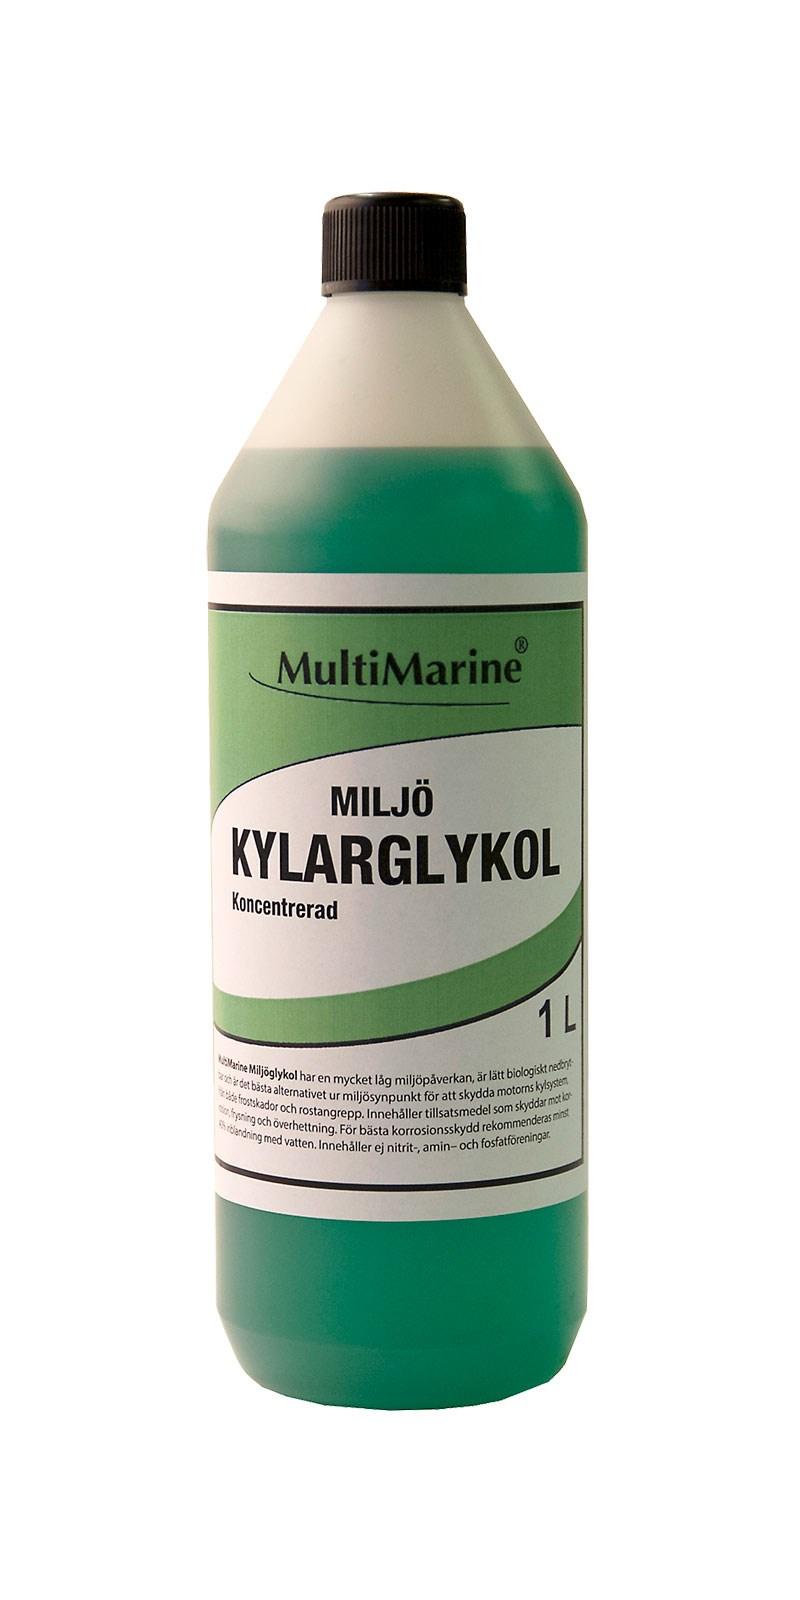 Multimarine Miljöglykol grön (Propylenglykol) 1 liter